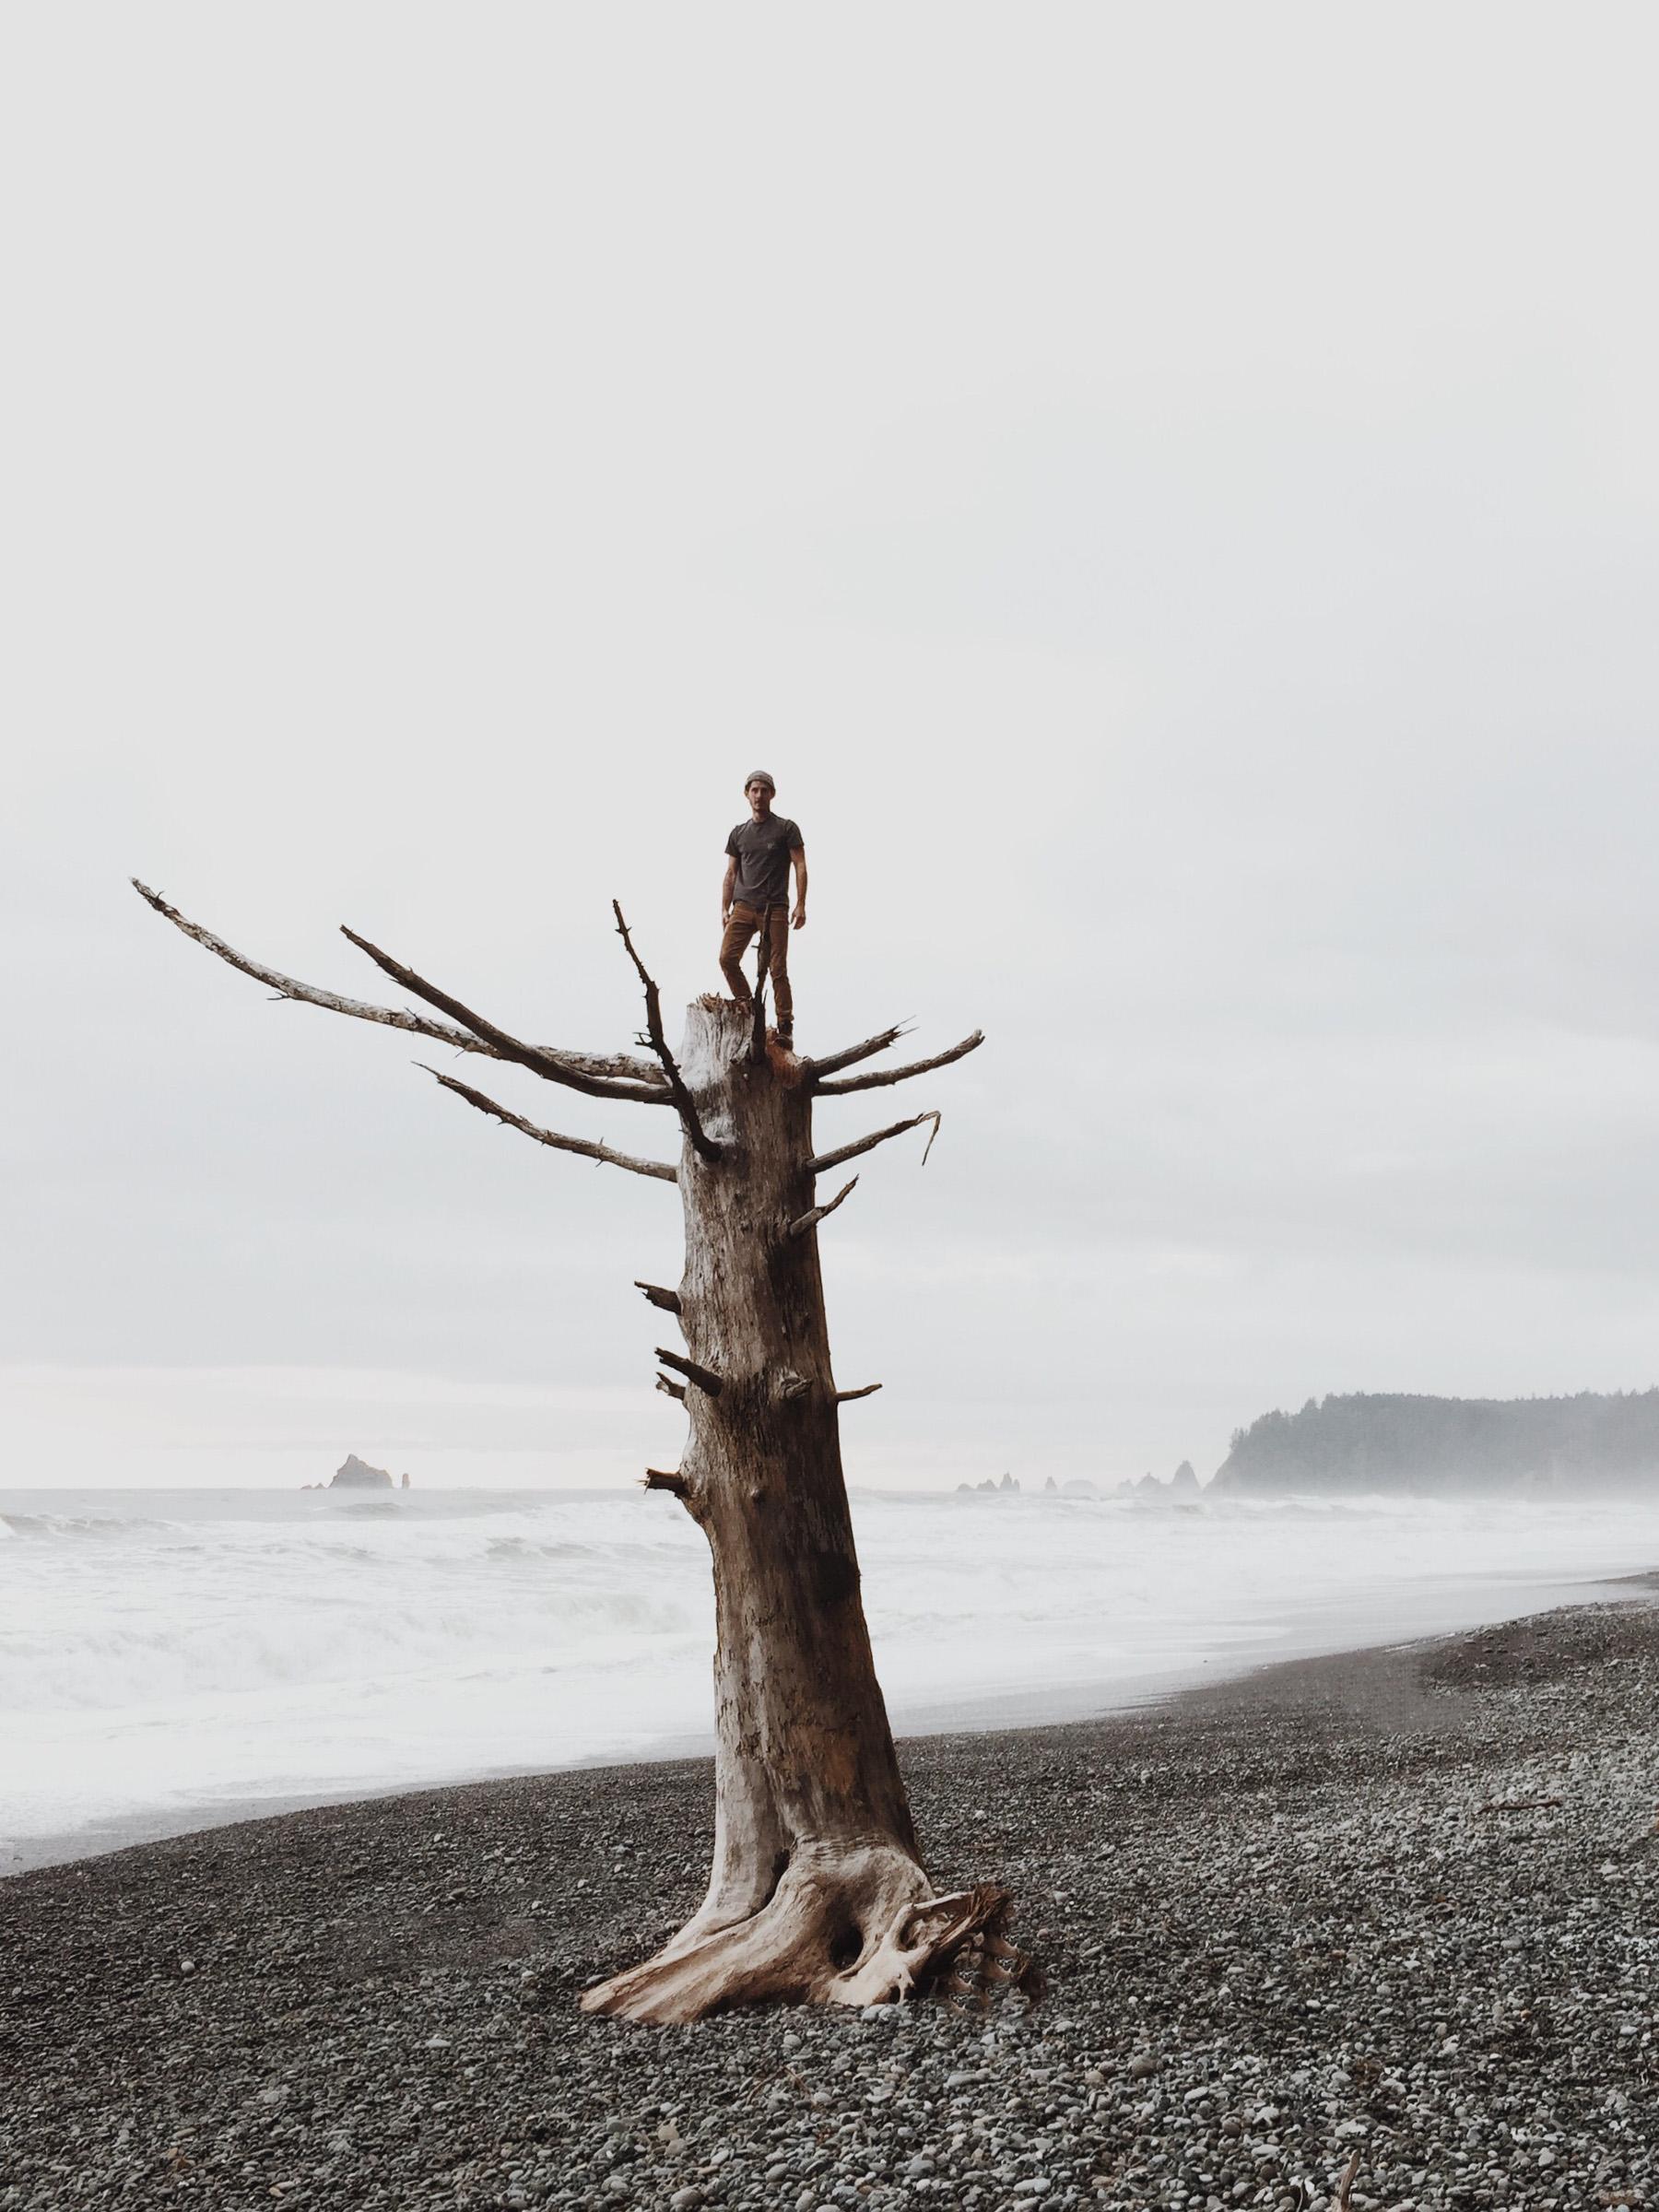 Rialto Beach Aventure | Katch Silva